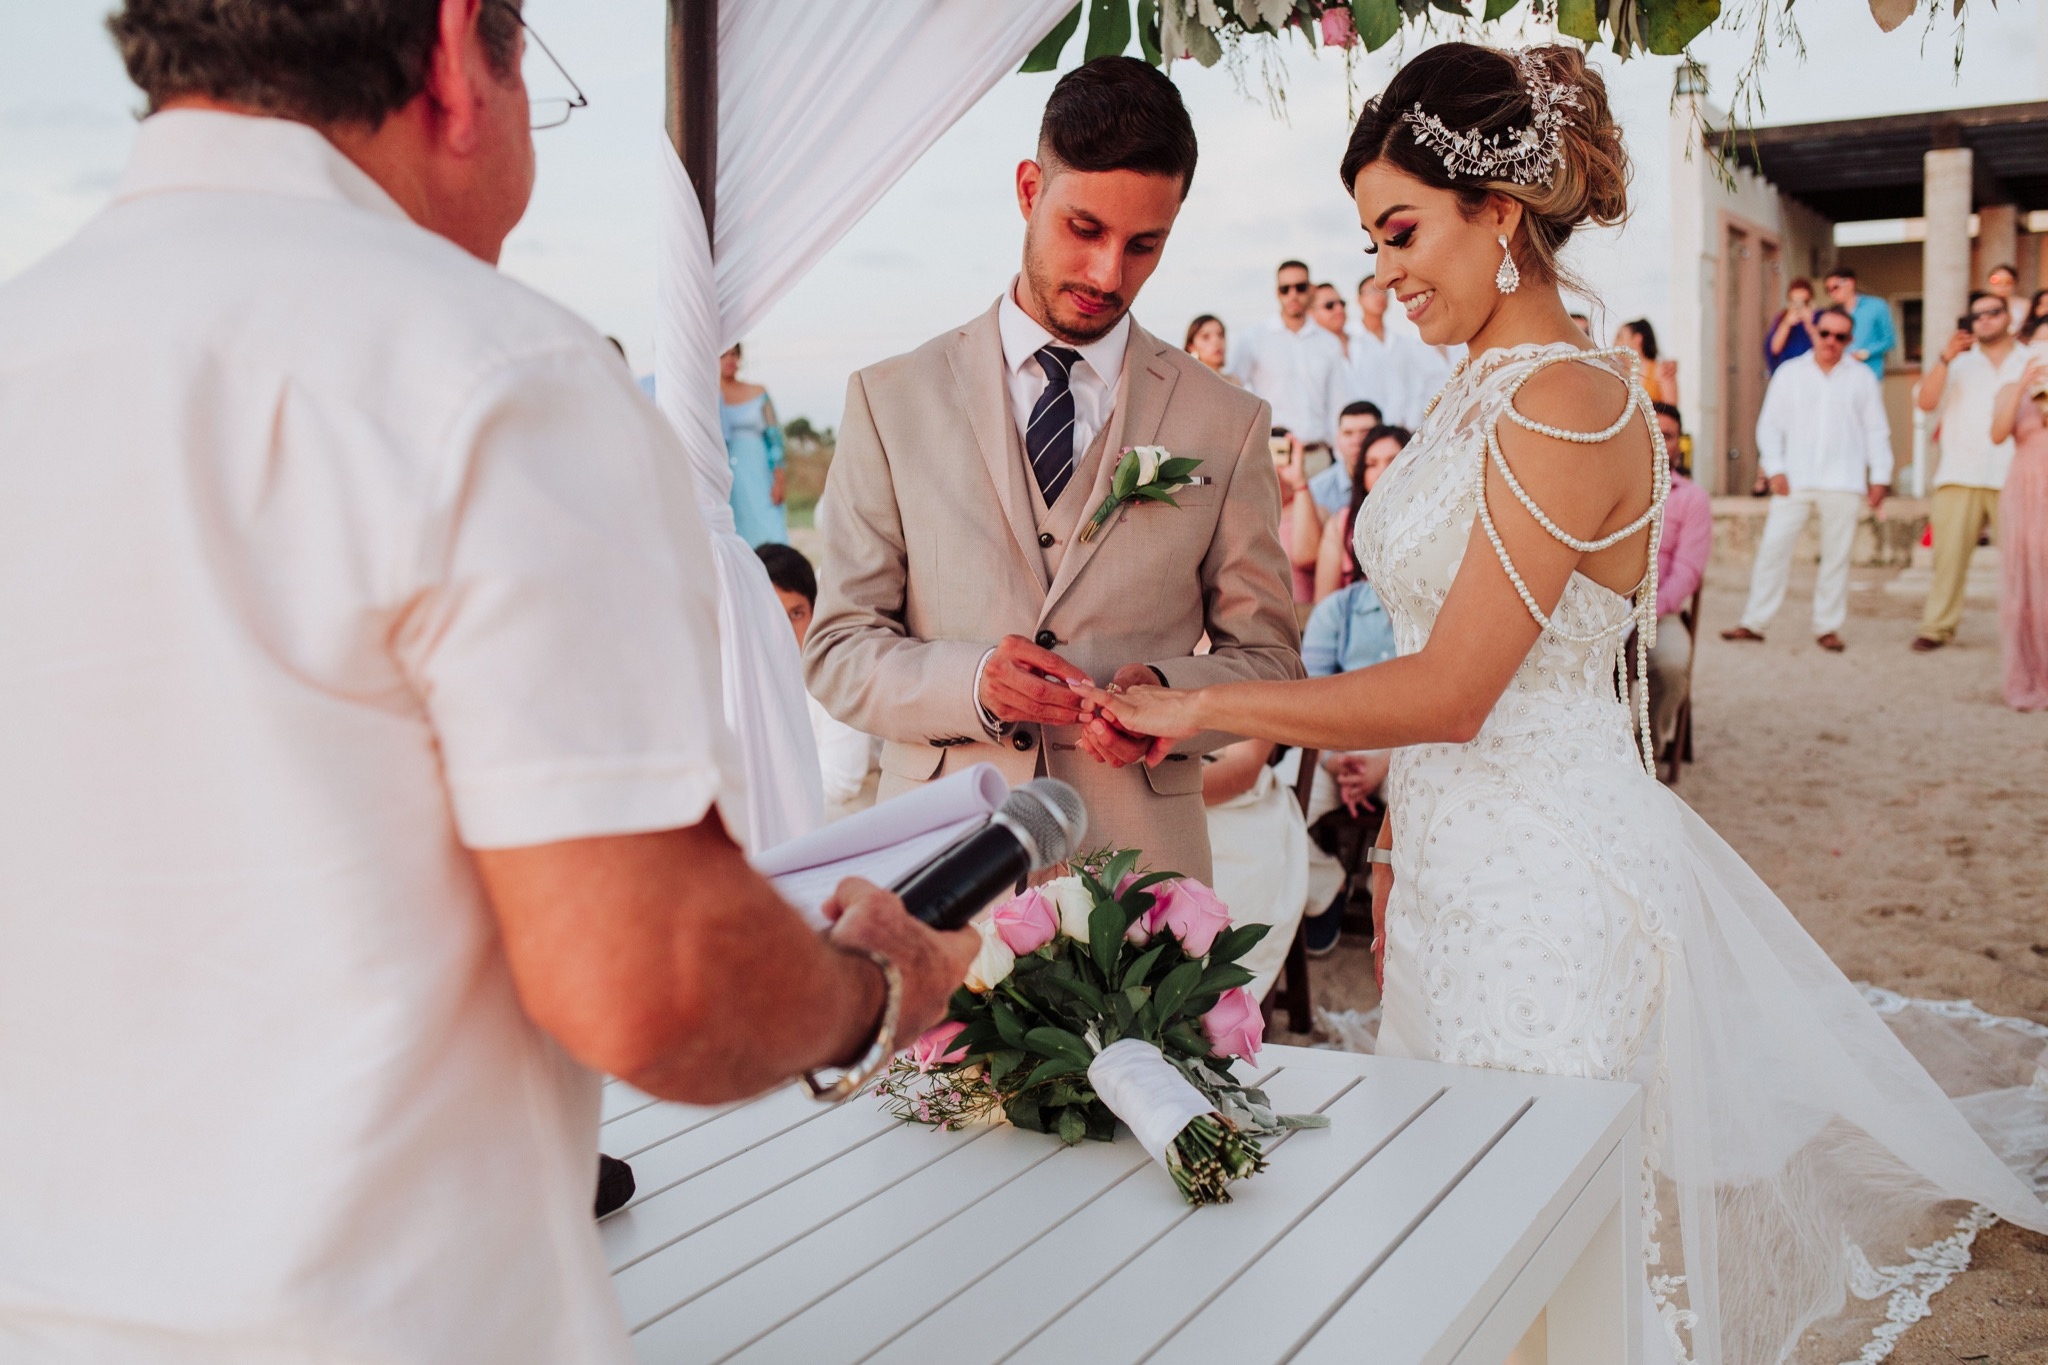 Javier_noriega_fotografo_bodas_profesional_zacatecas_mexico_mazatlan_sinaloa_photographer_weddings61